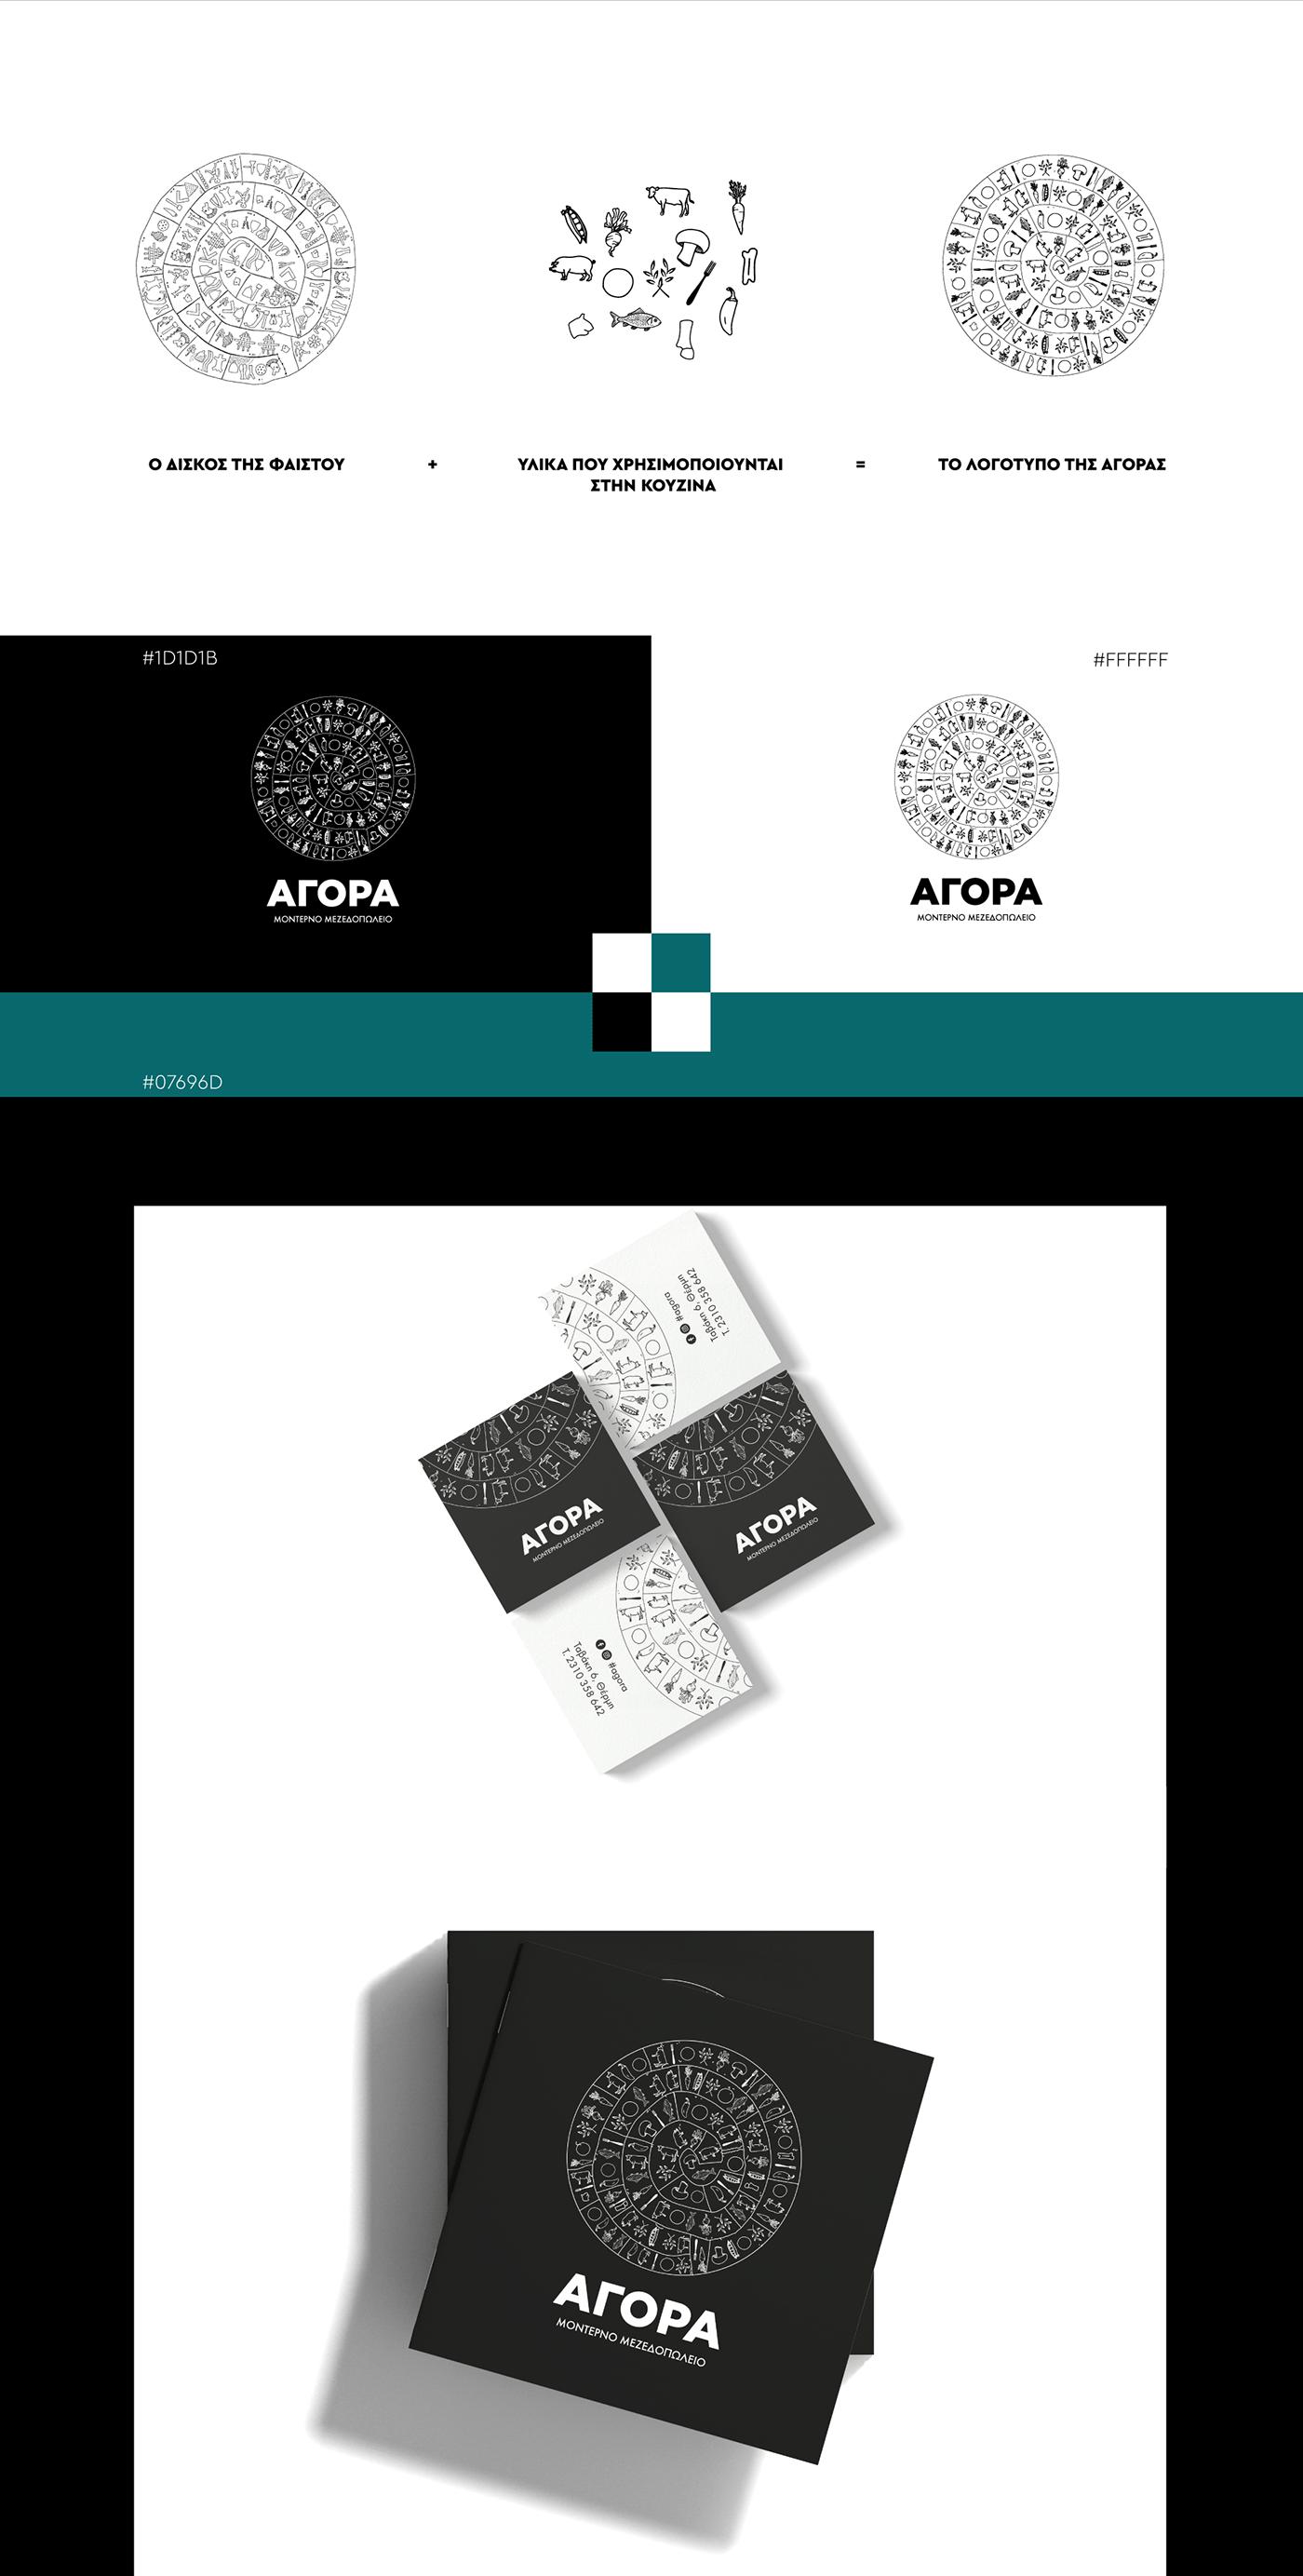 brand branding  design Food  graphic Identiny logo presentation